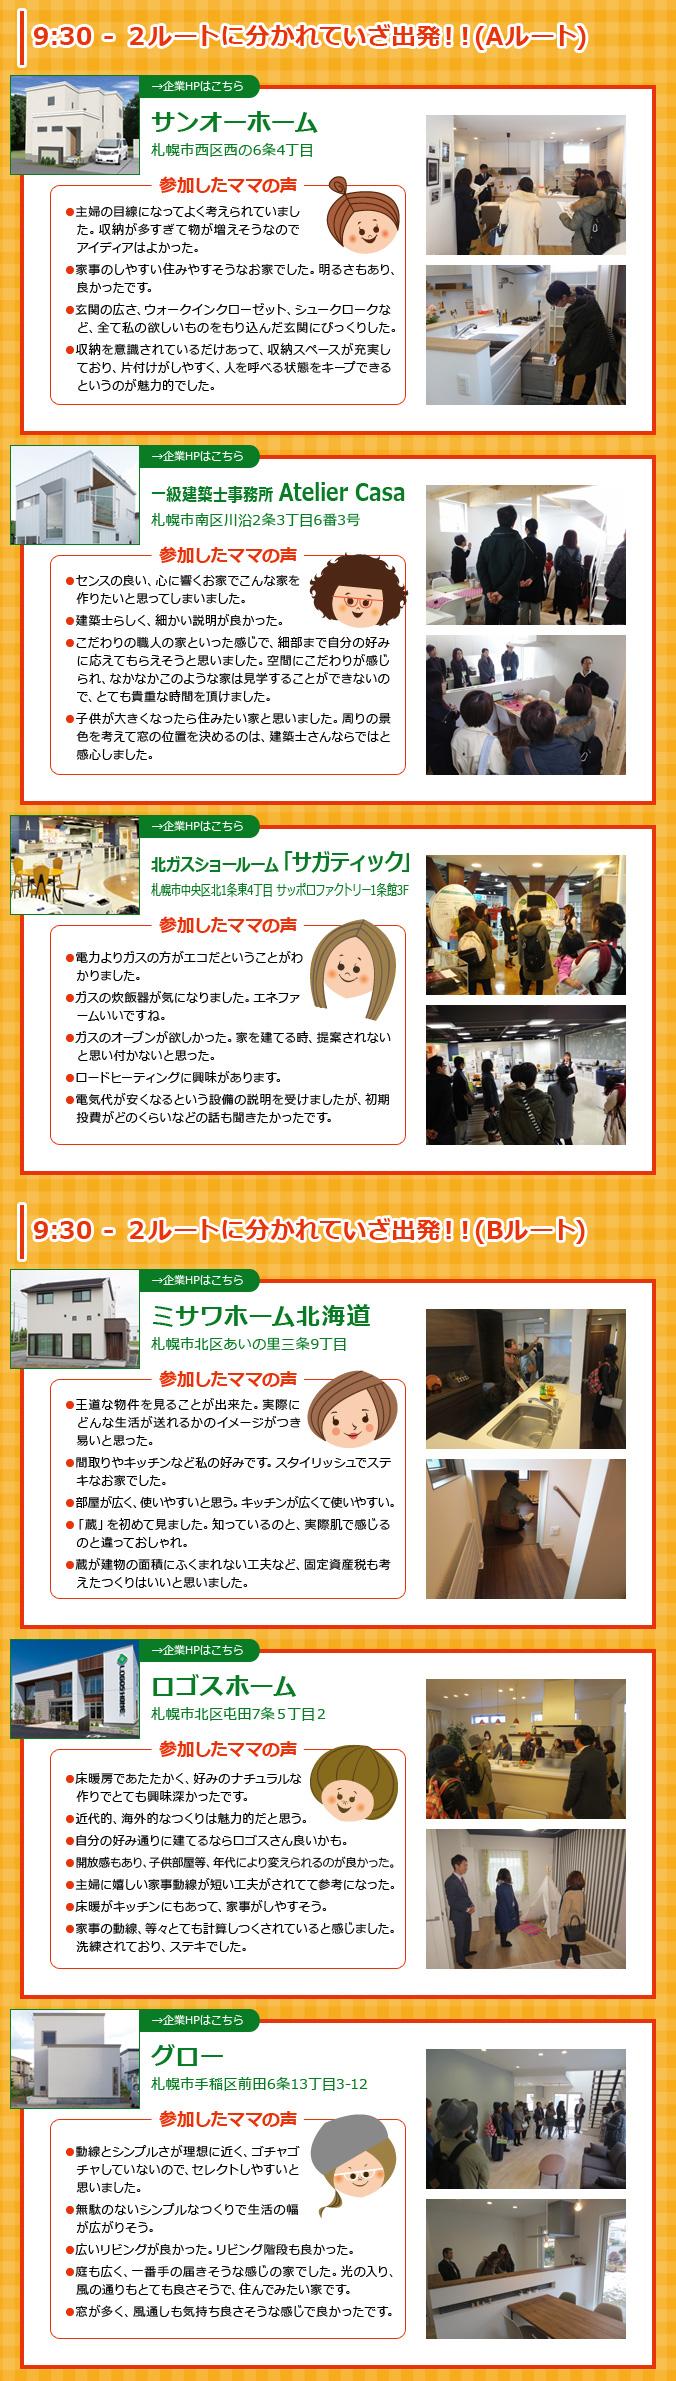 20161107_01